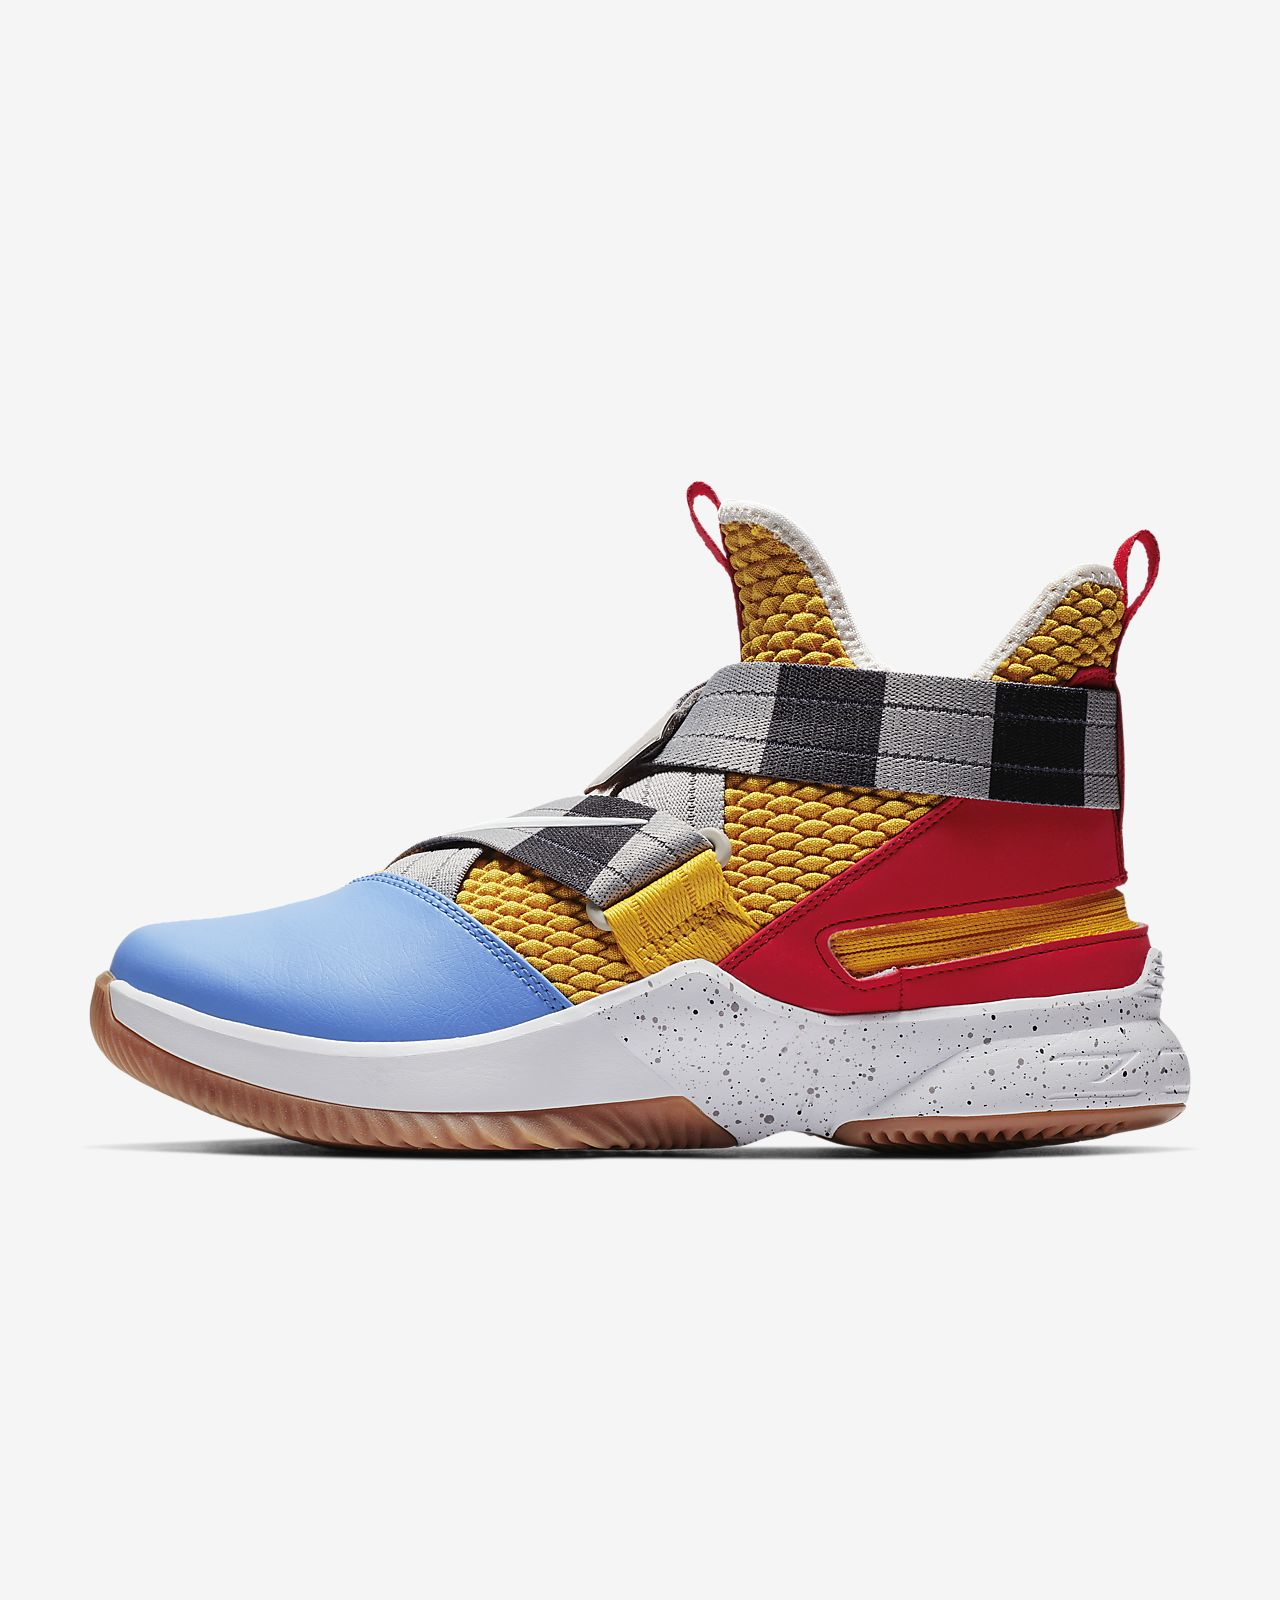 De Flyease Basketball Chaussure Soldier 12 Pour HommeNike Lebron wOPk80n